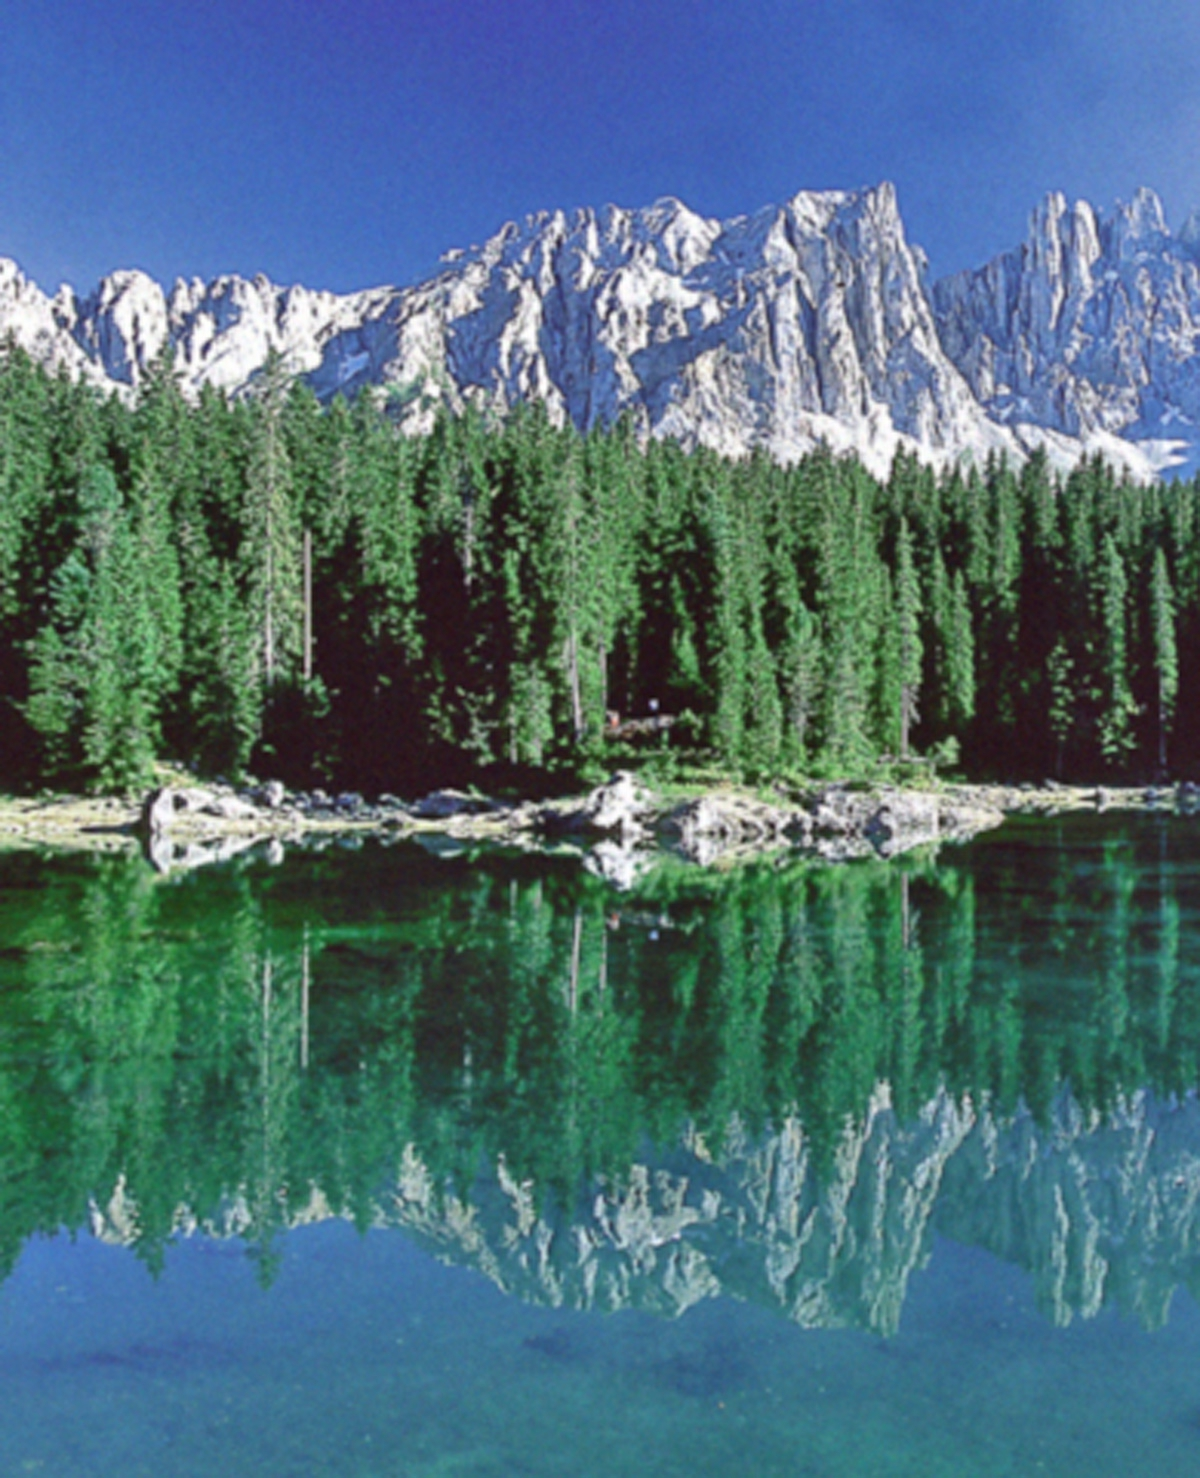 8 dagen Zuid-Tirol vanaf €469 p.p.